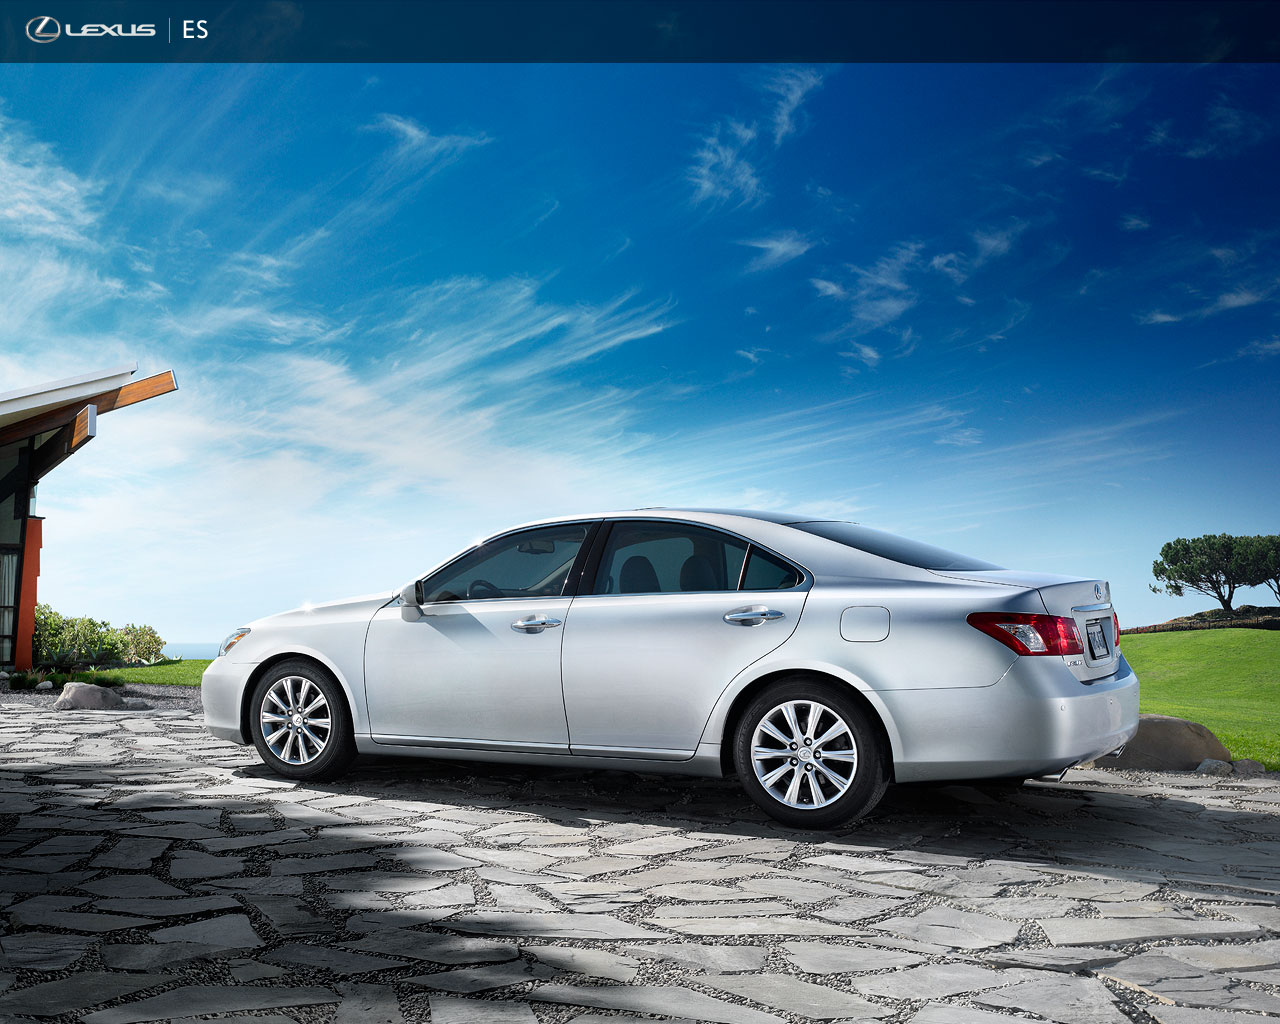 Country Auto Sales >> 2008 Lexus ES 350 News and Information | conceptcarz.com